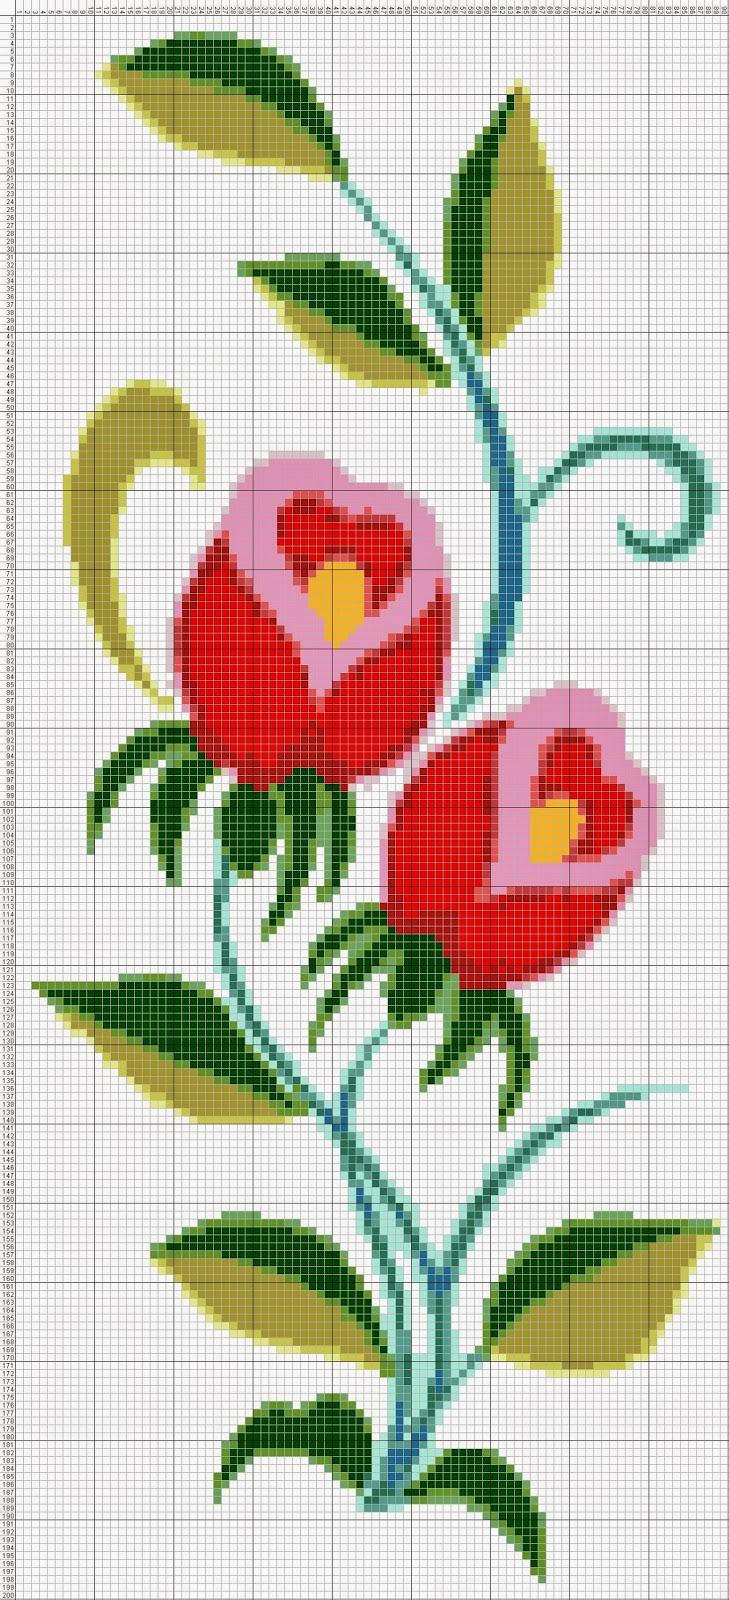 Gambar Pola Kristik Bunga Merah (2)